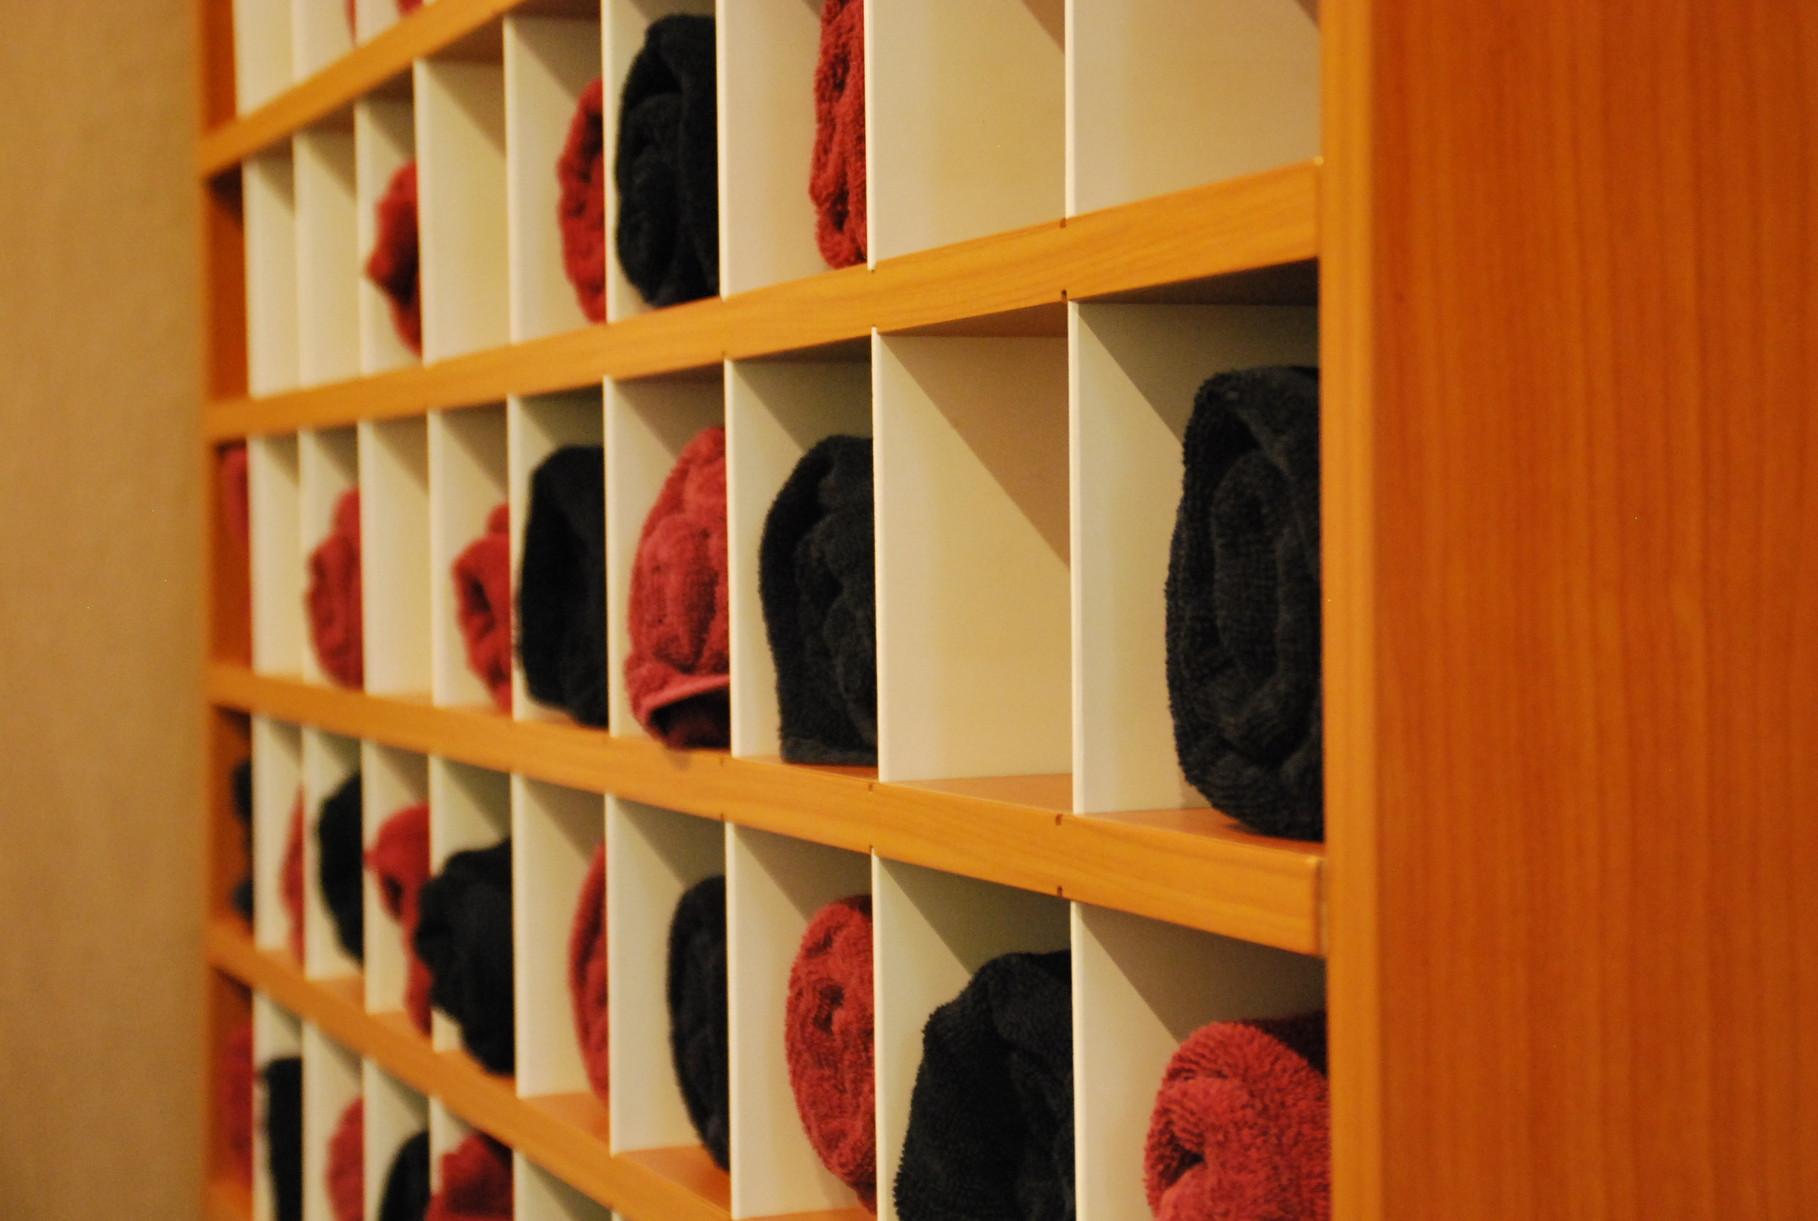 unser friseursalon h h kreative k pfe friseur und kosmetik in berlin prenzlauer berg. Black Bedroom Furniture Sets. Home Design Ideas